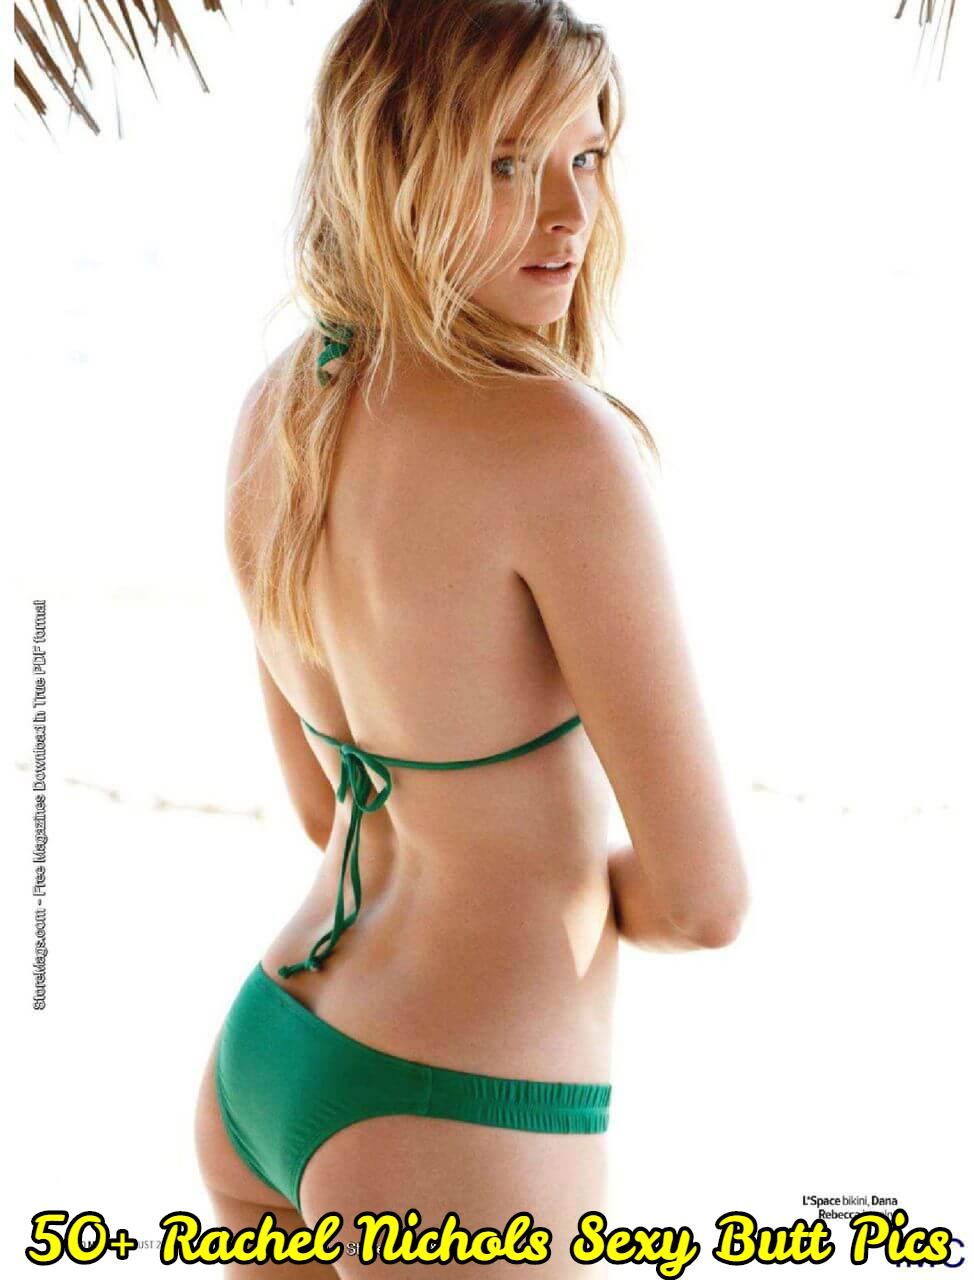 Rachel Nichols Sexy Butt Pics